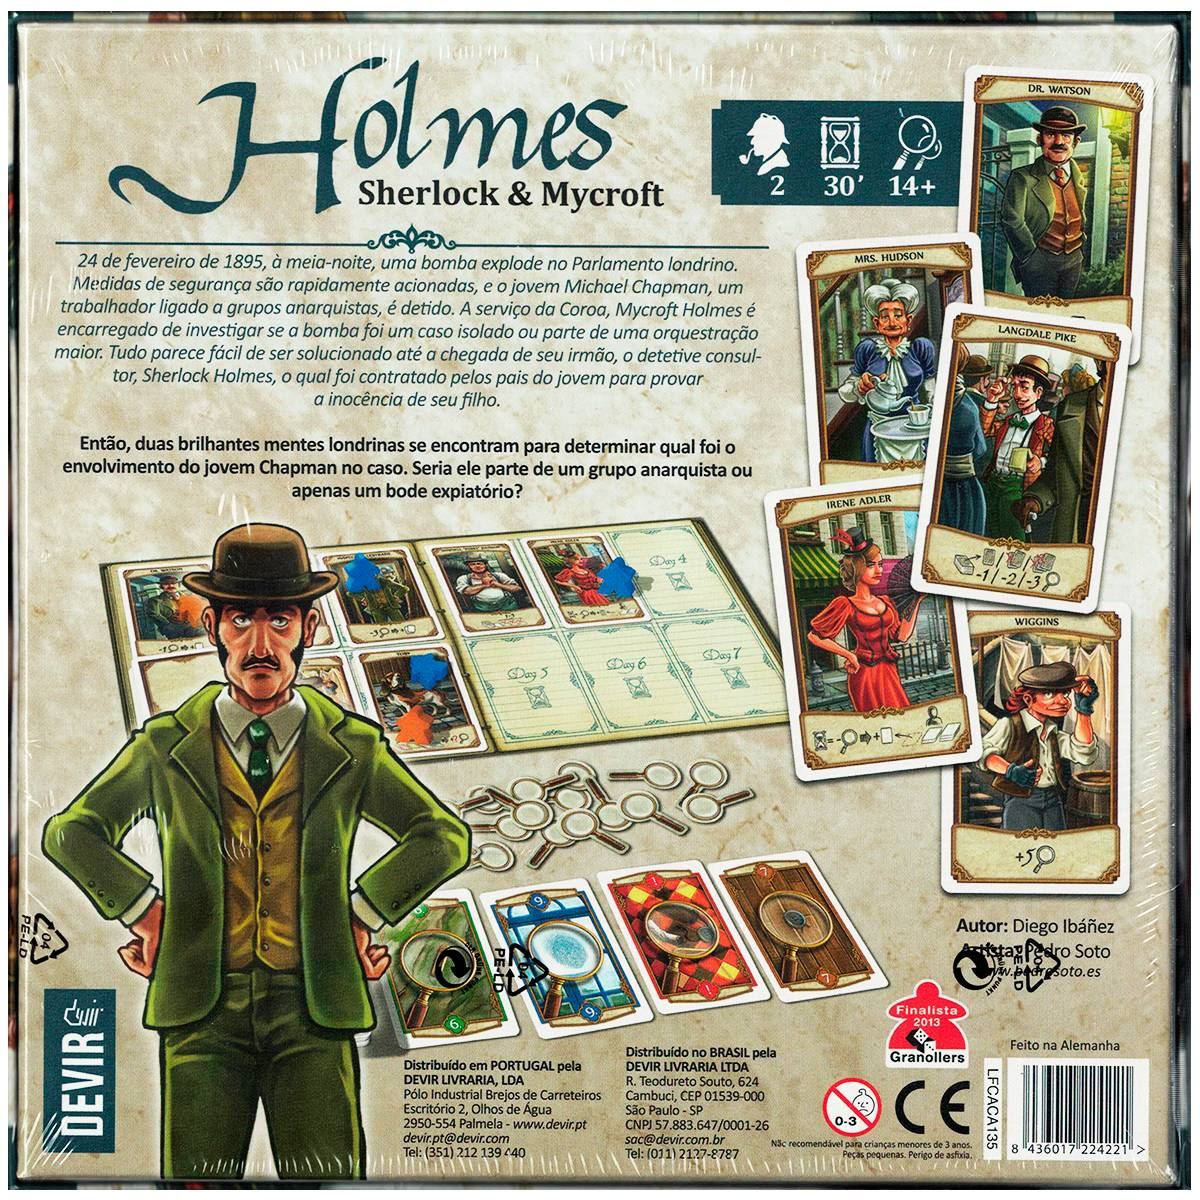 Holmes Sherlock Mycroft  Jogo de Tabuleiro Devir